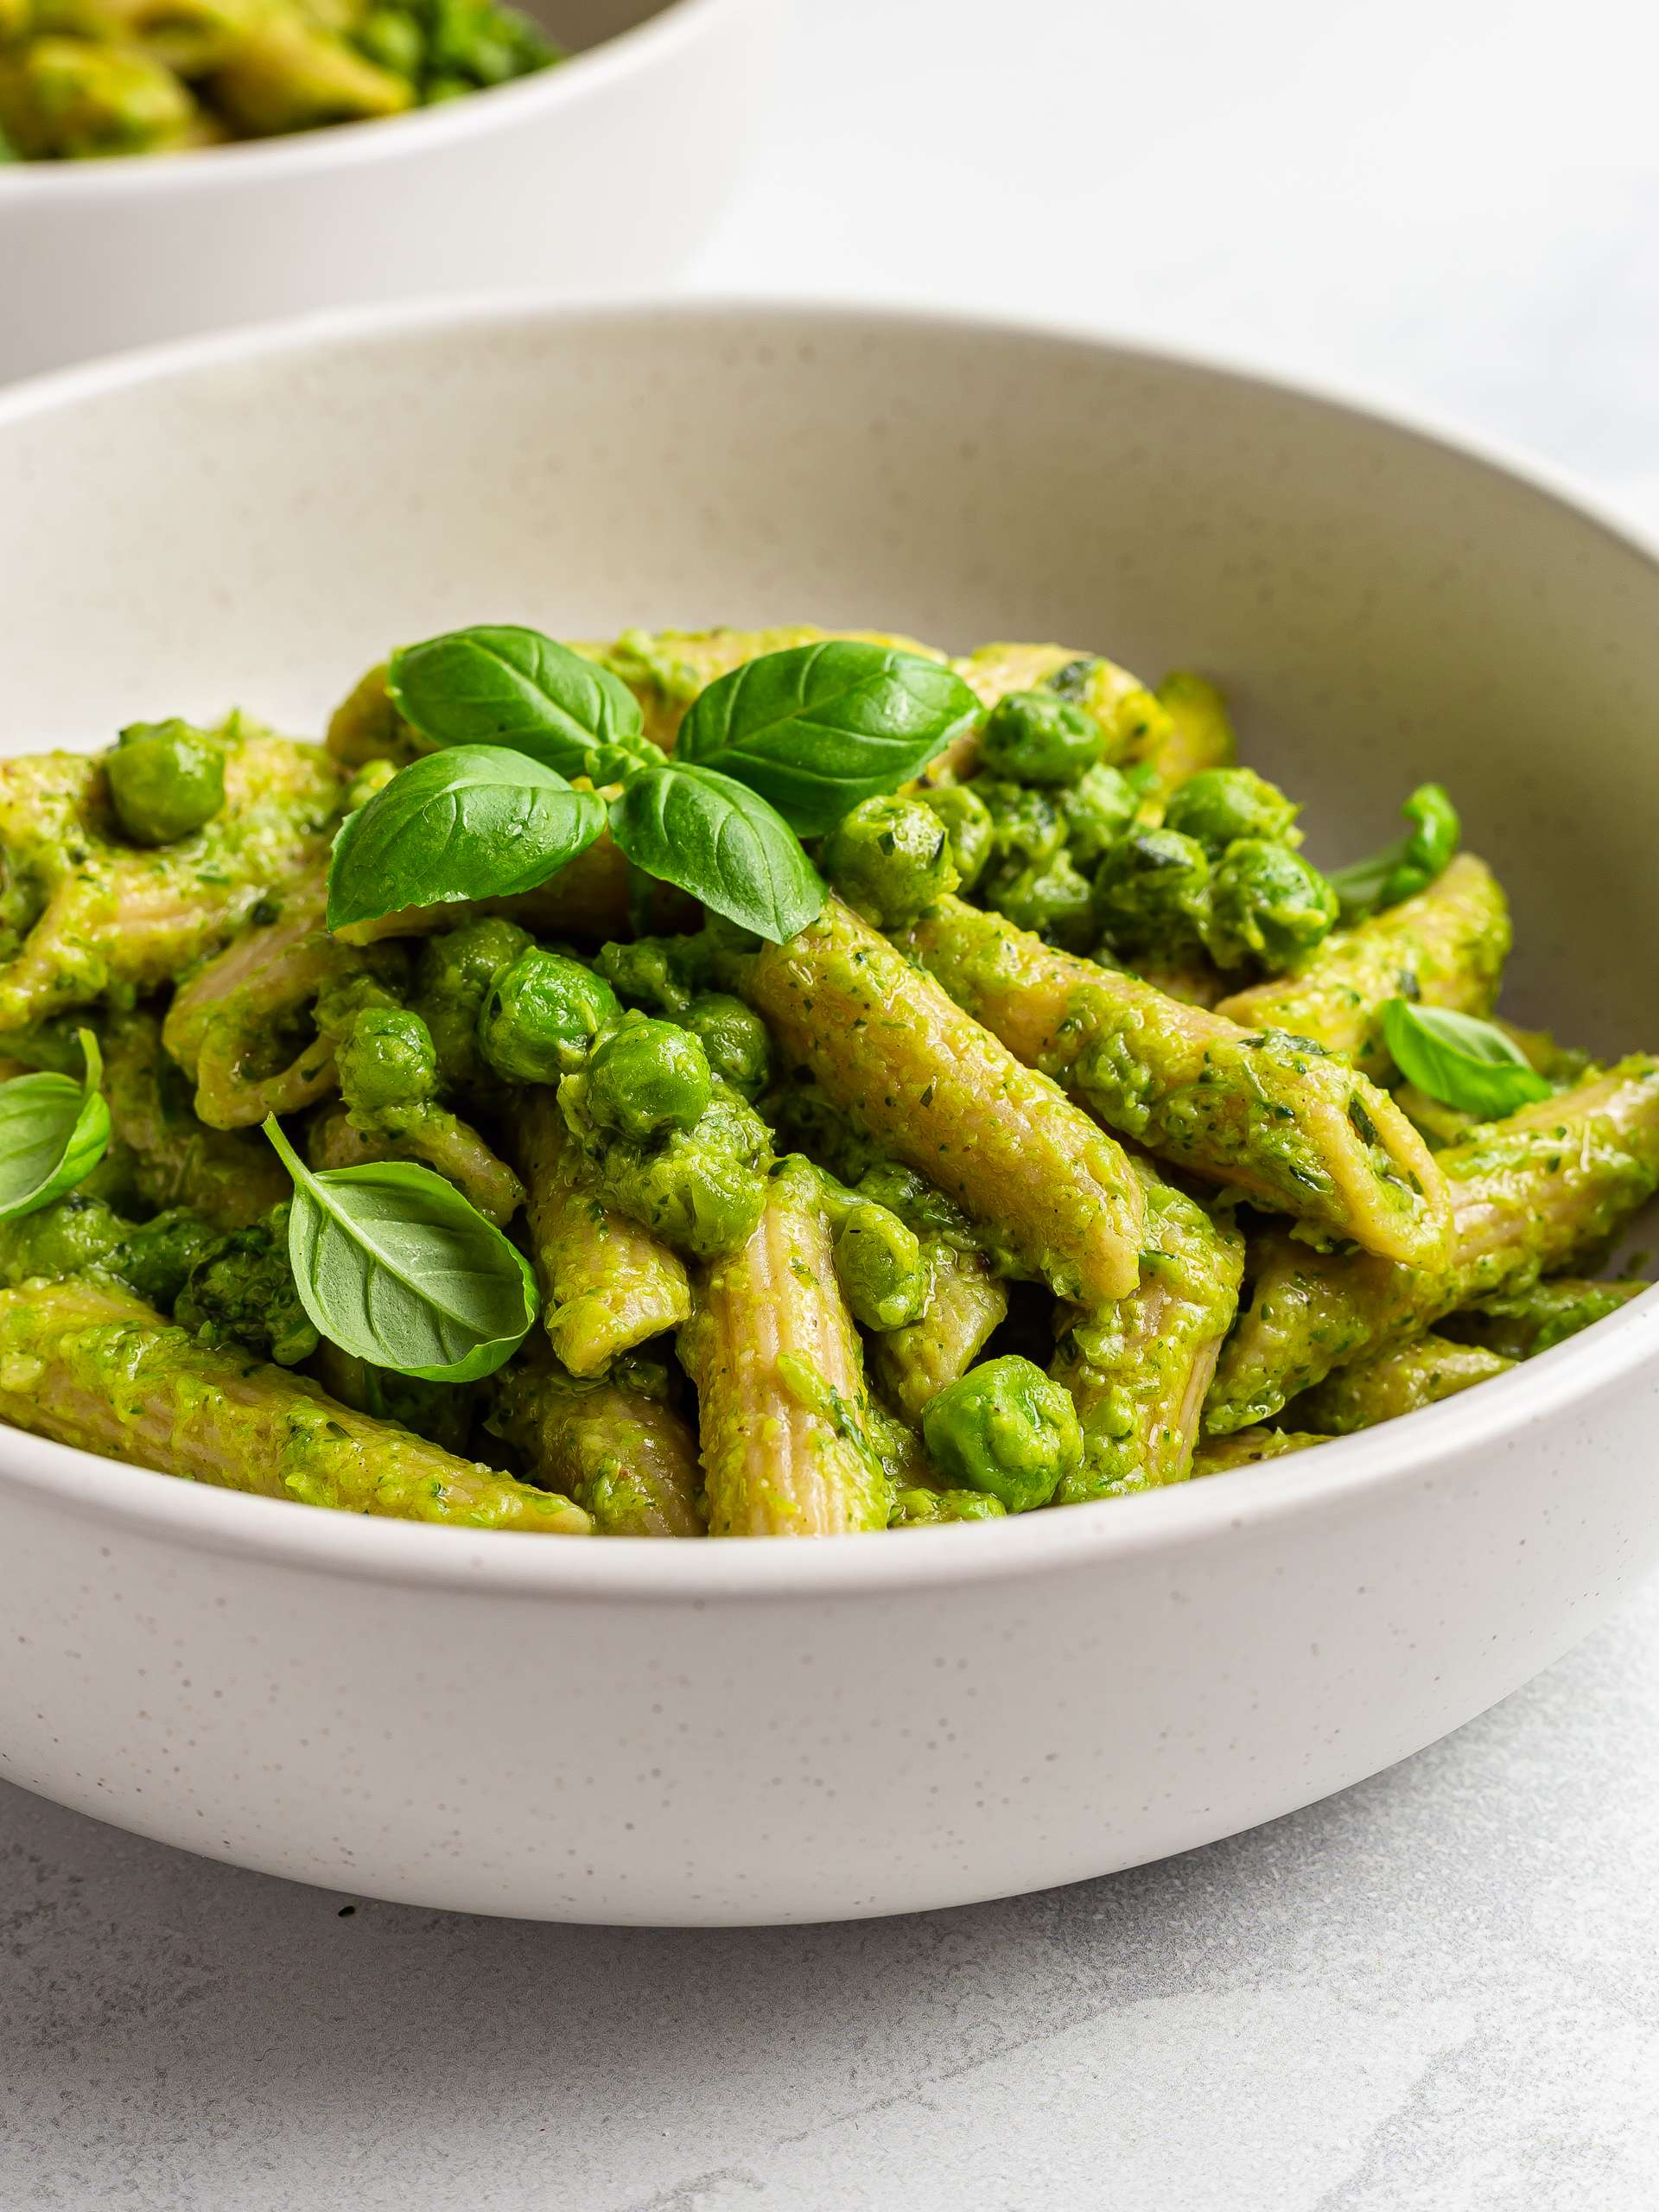 High-Fibre Pasta with Green Peas Recipe Thumbnail